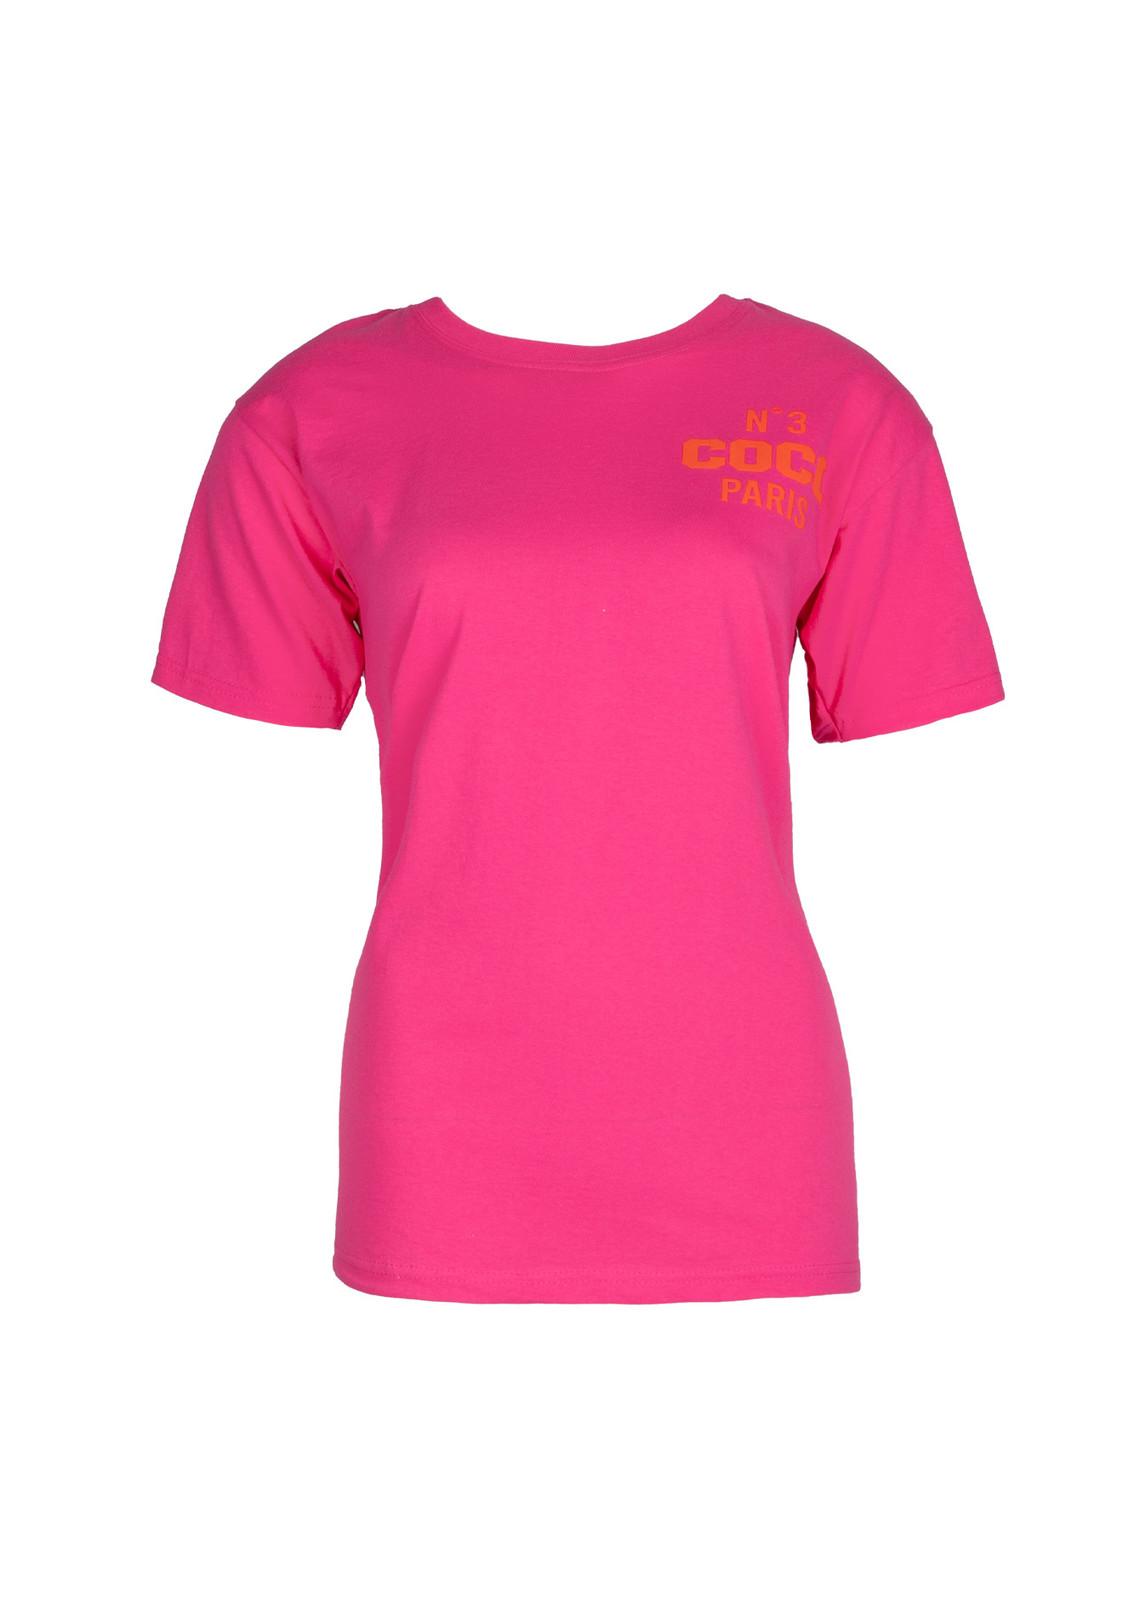 T-shirt Coco fusia